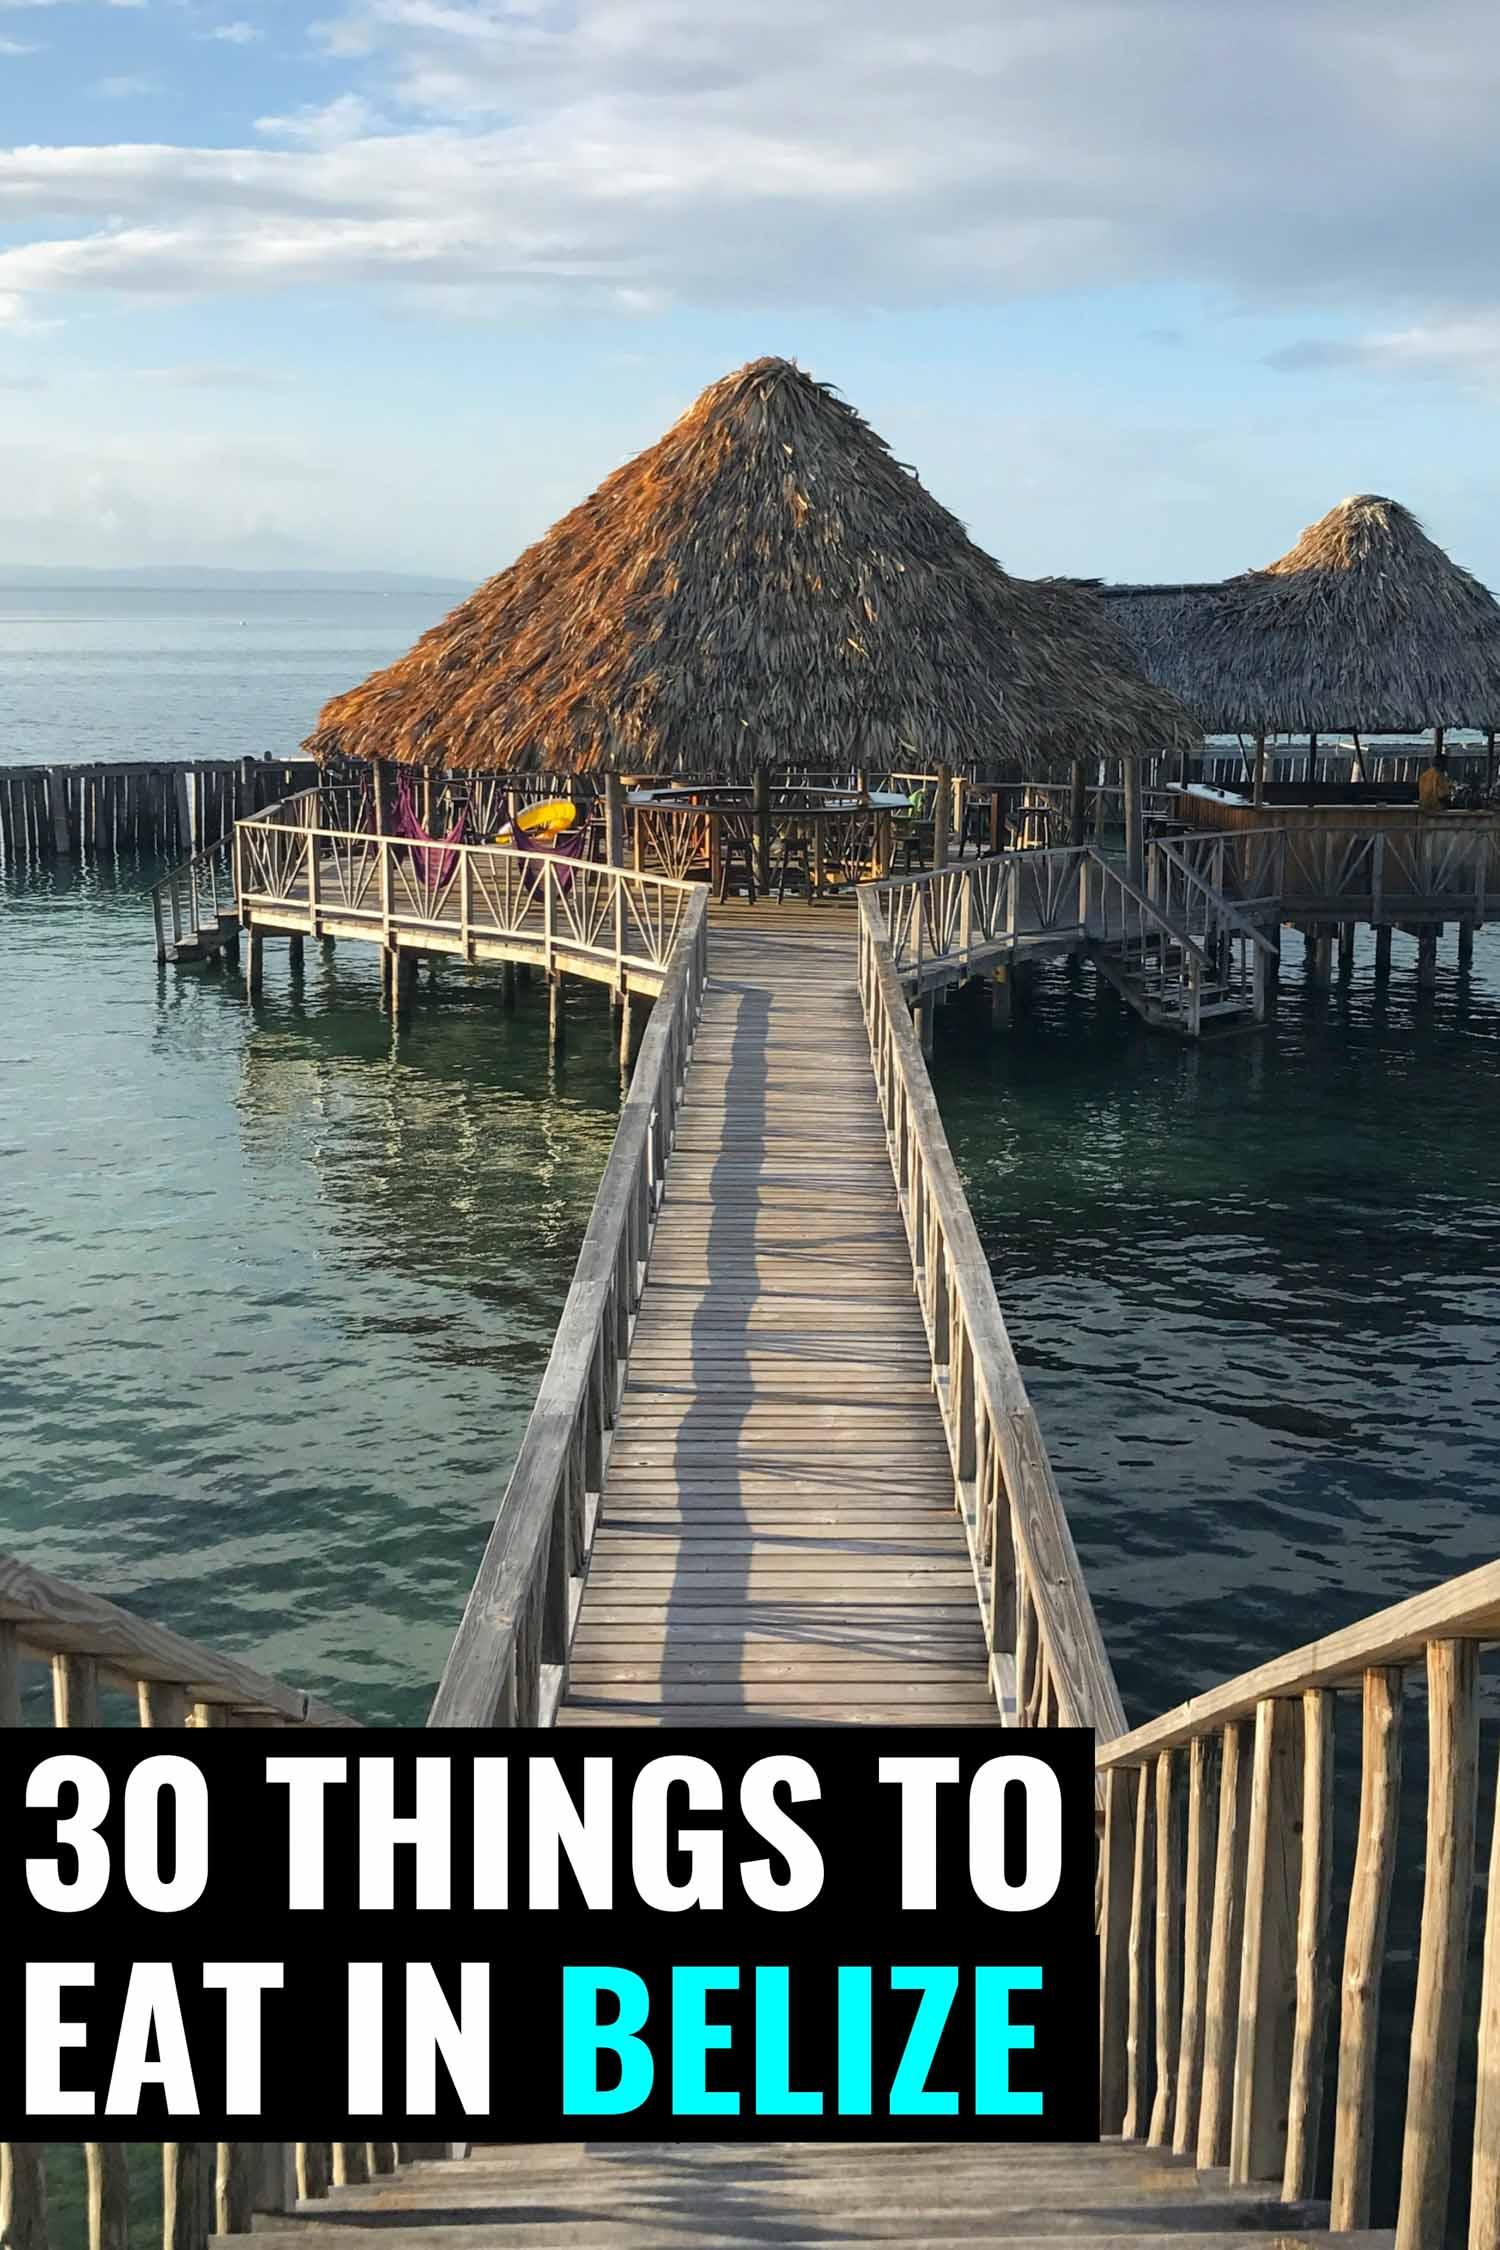 Restaurant on the ocean in Caye Caulker Belize